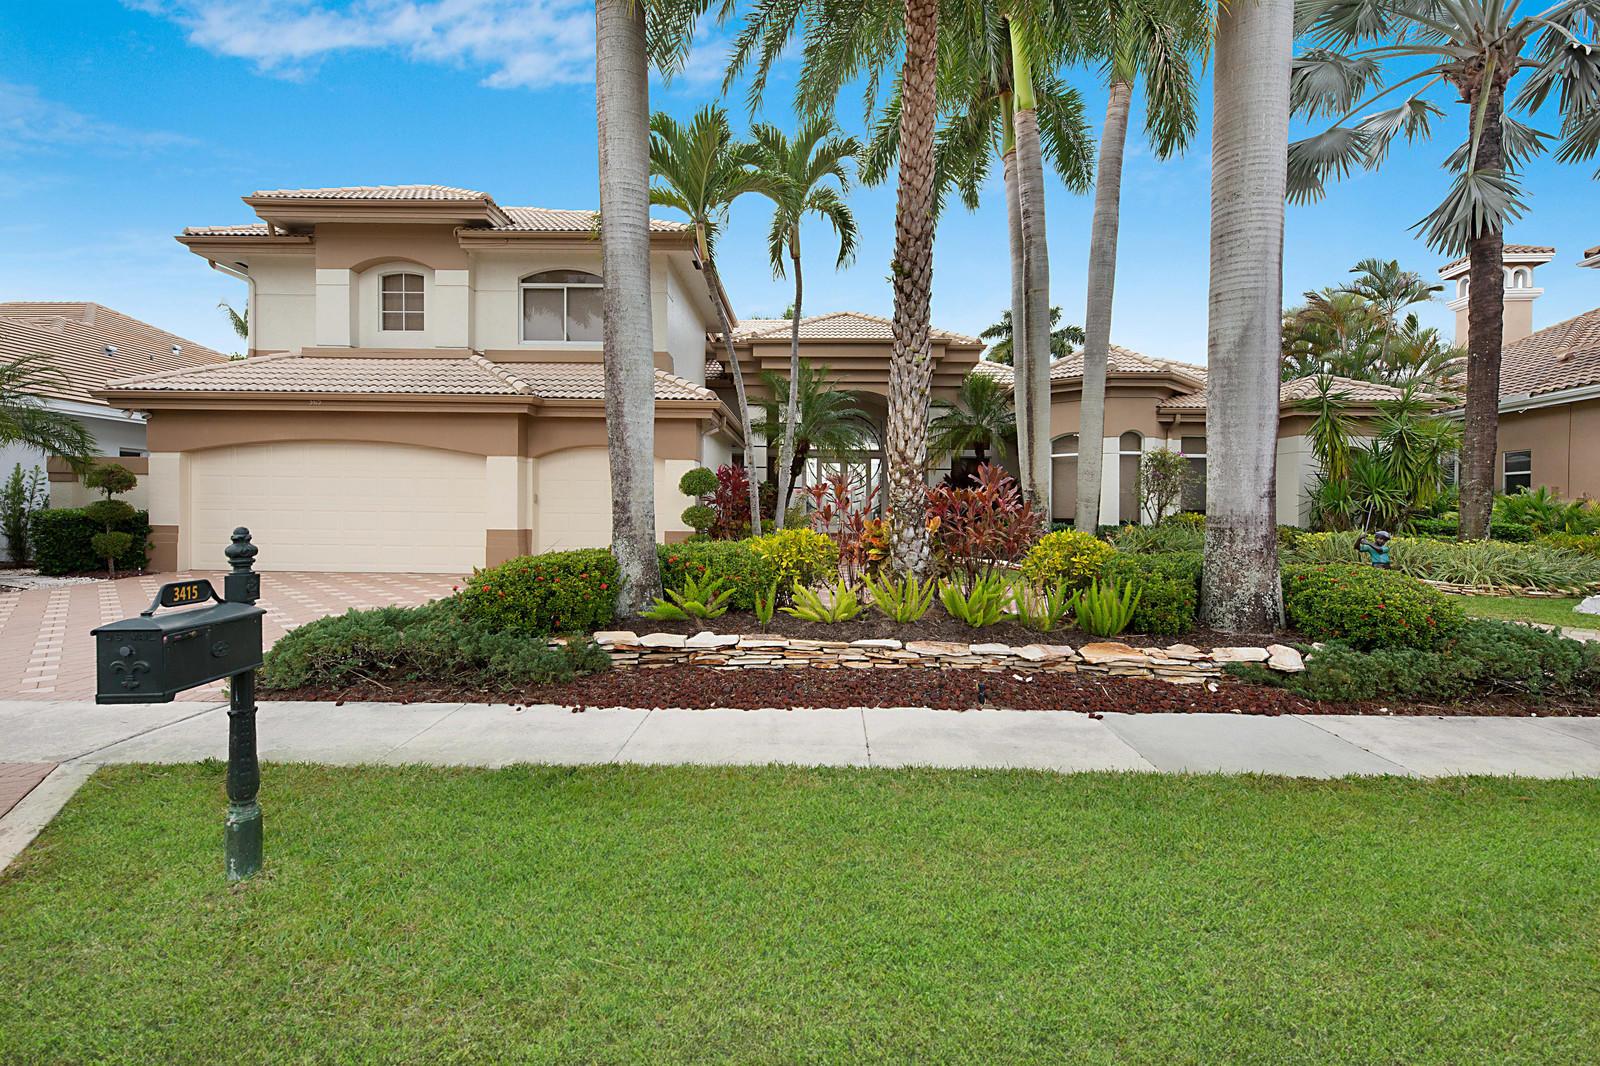 Photo of 3415 Windsor Place, Boca Raton, FL 33496